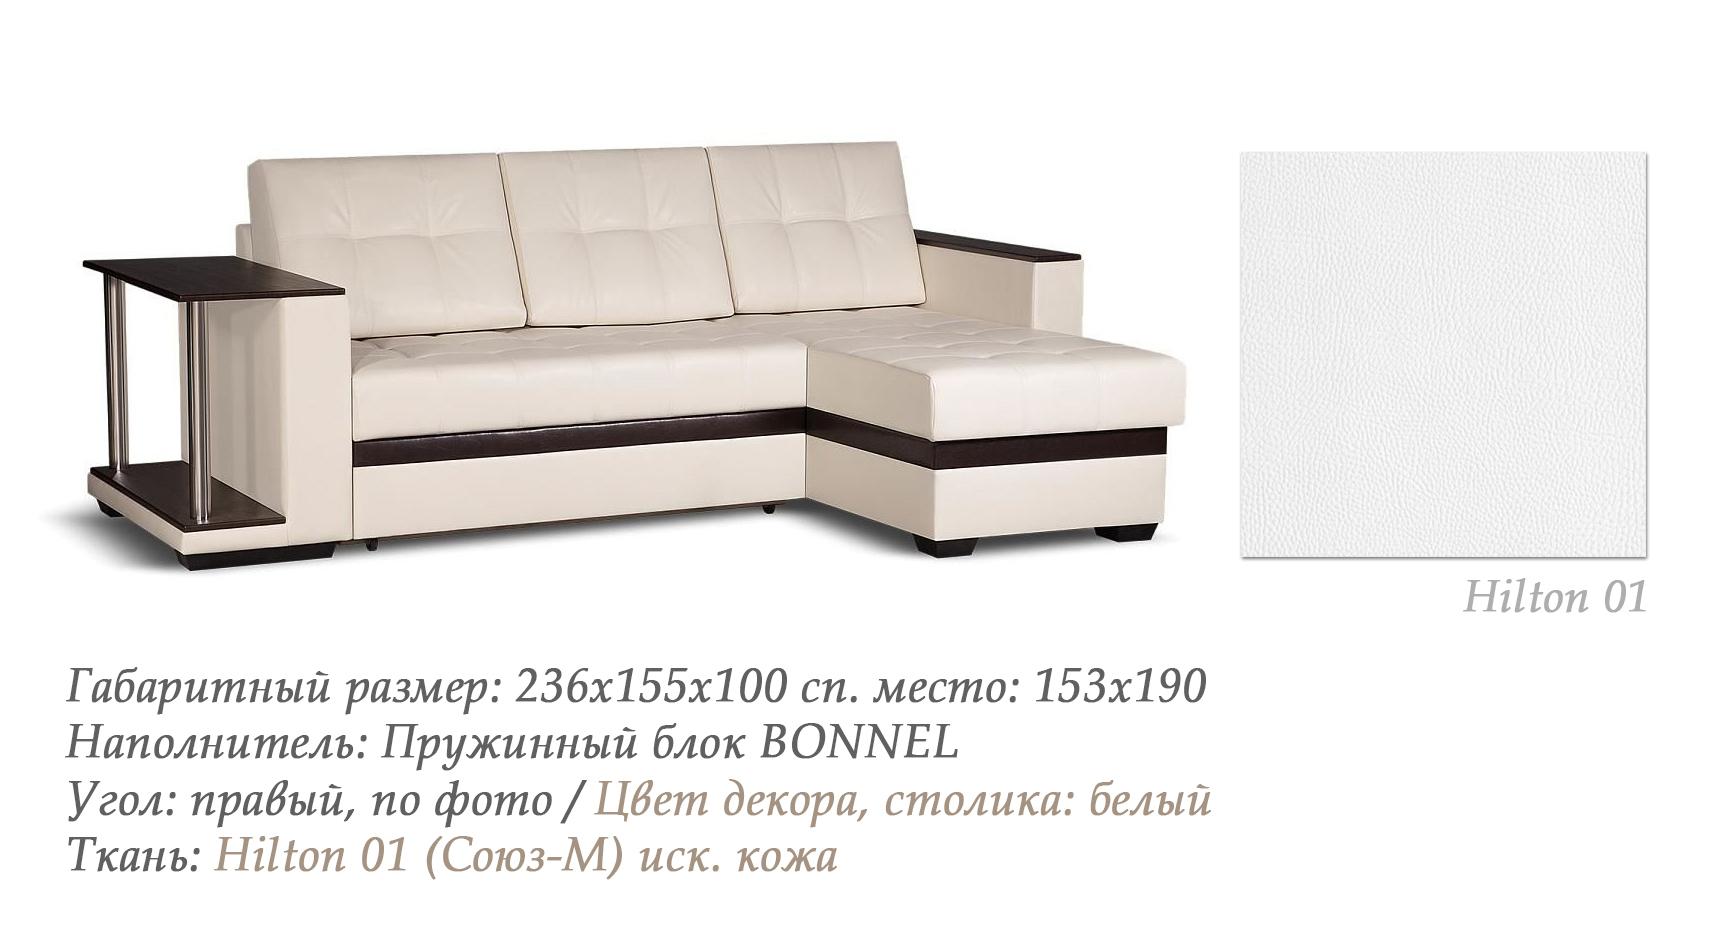 Угловой диван Адамс со столиком-м264 4sis диван со столиком лабро